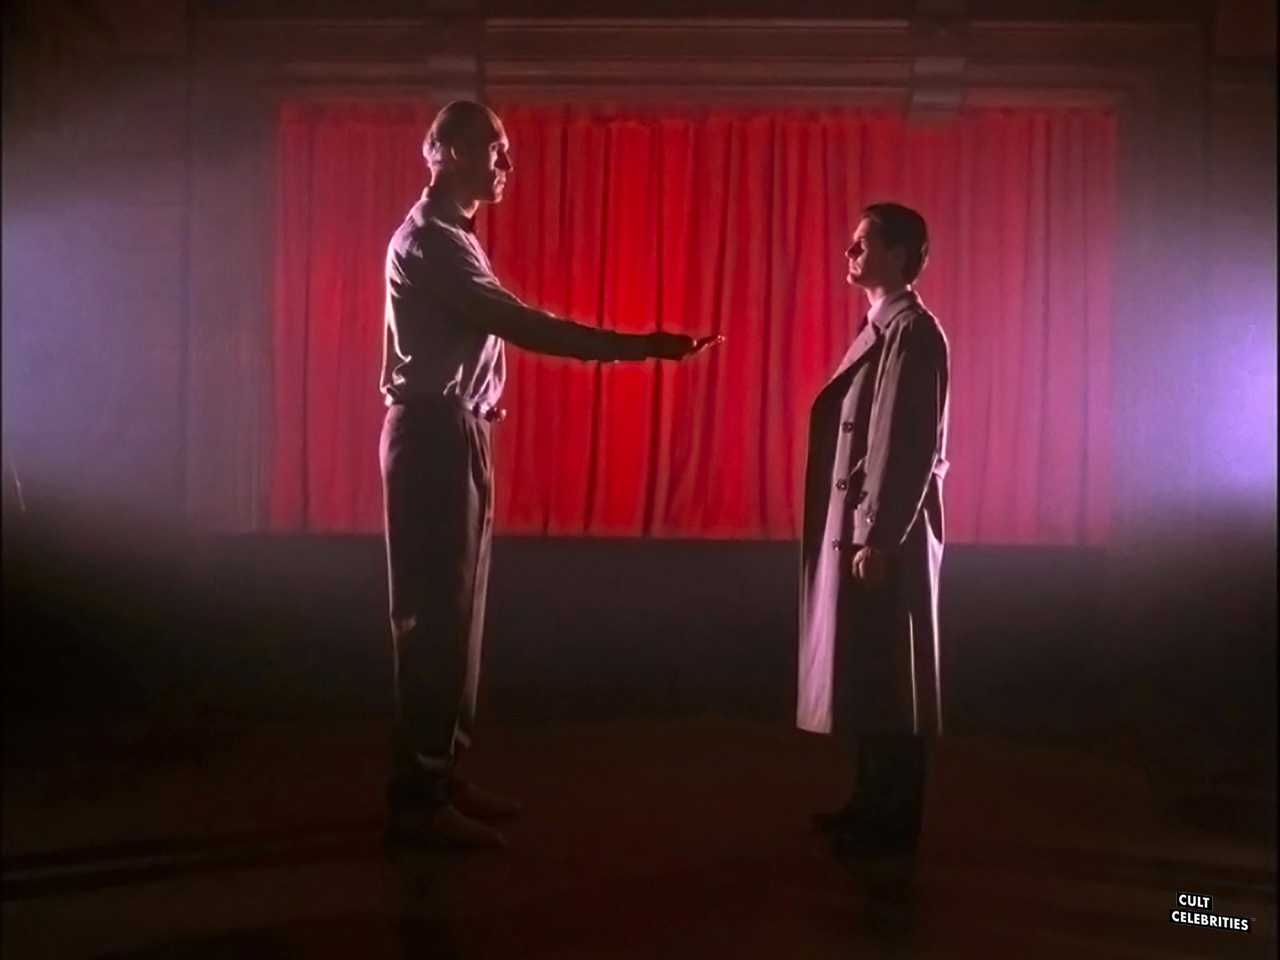 Kyle MacLachlan and Carel Struycken in Twin Peaks (1990-1991)